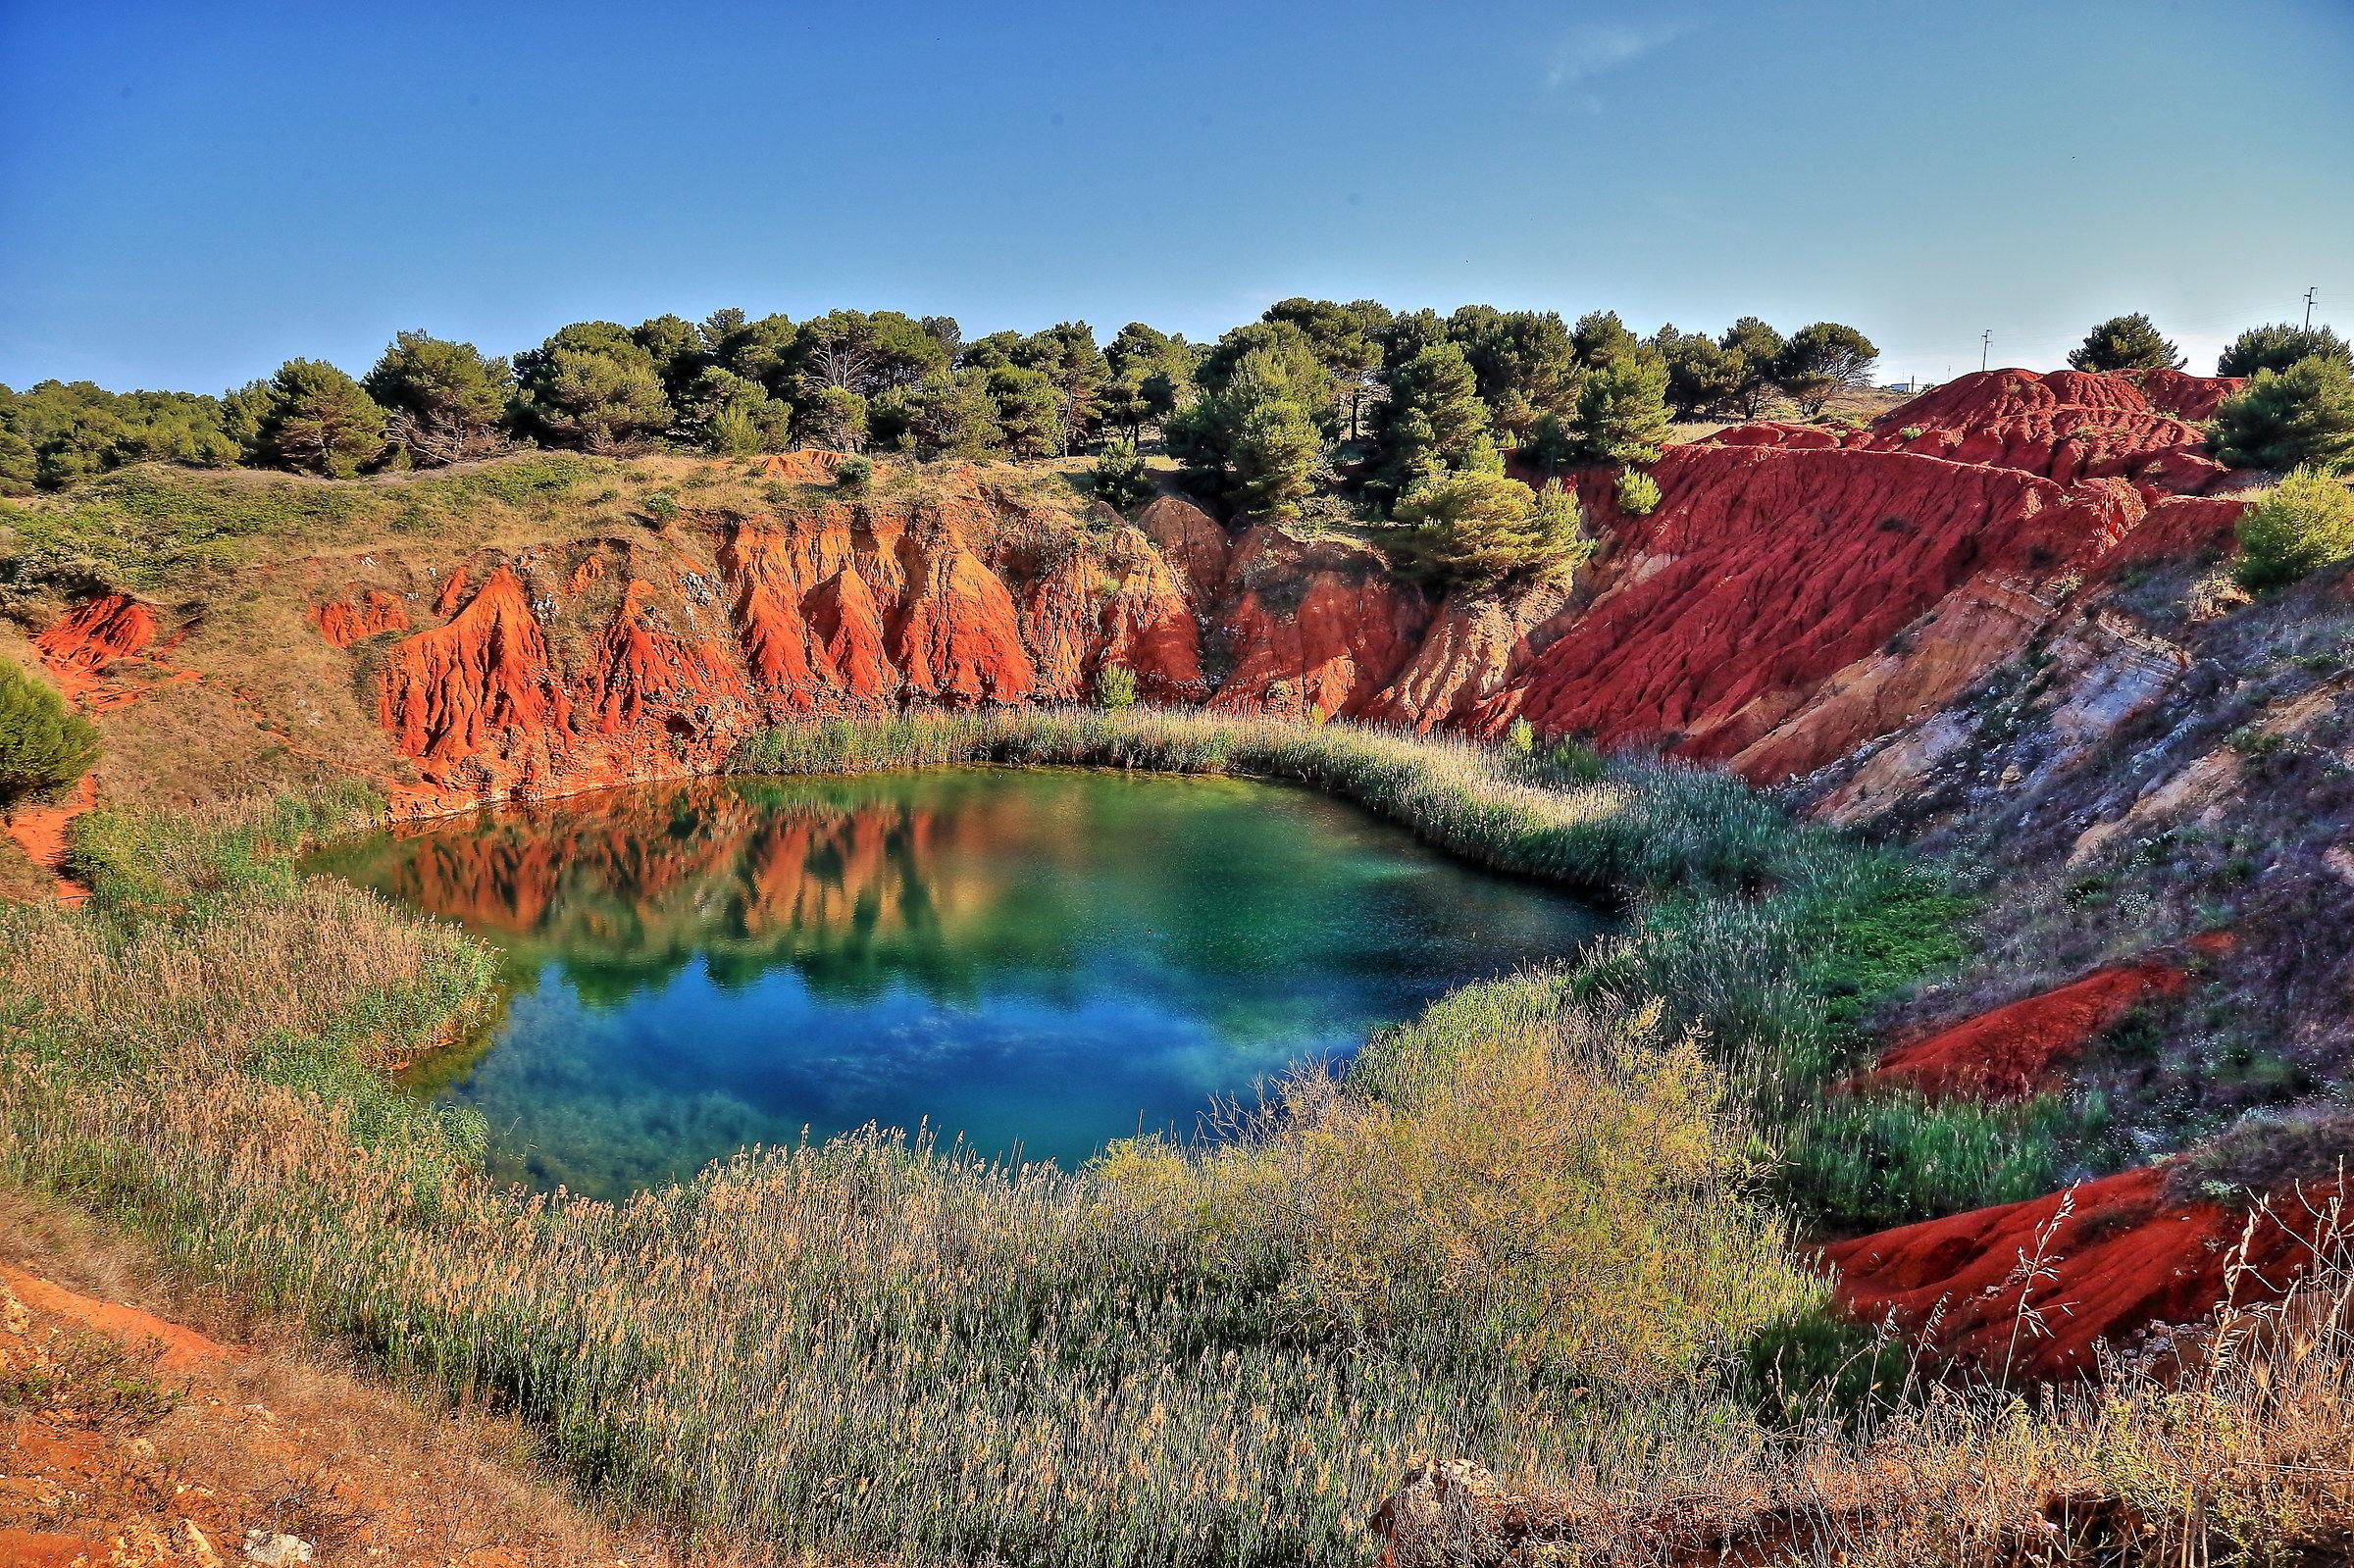 Bauxite ottawa quarry...